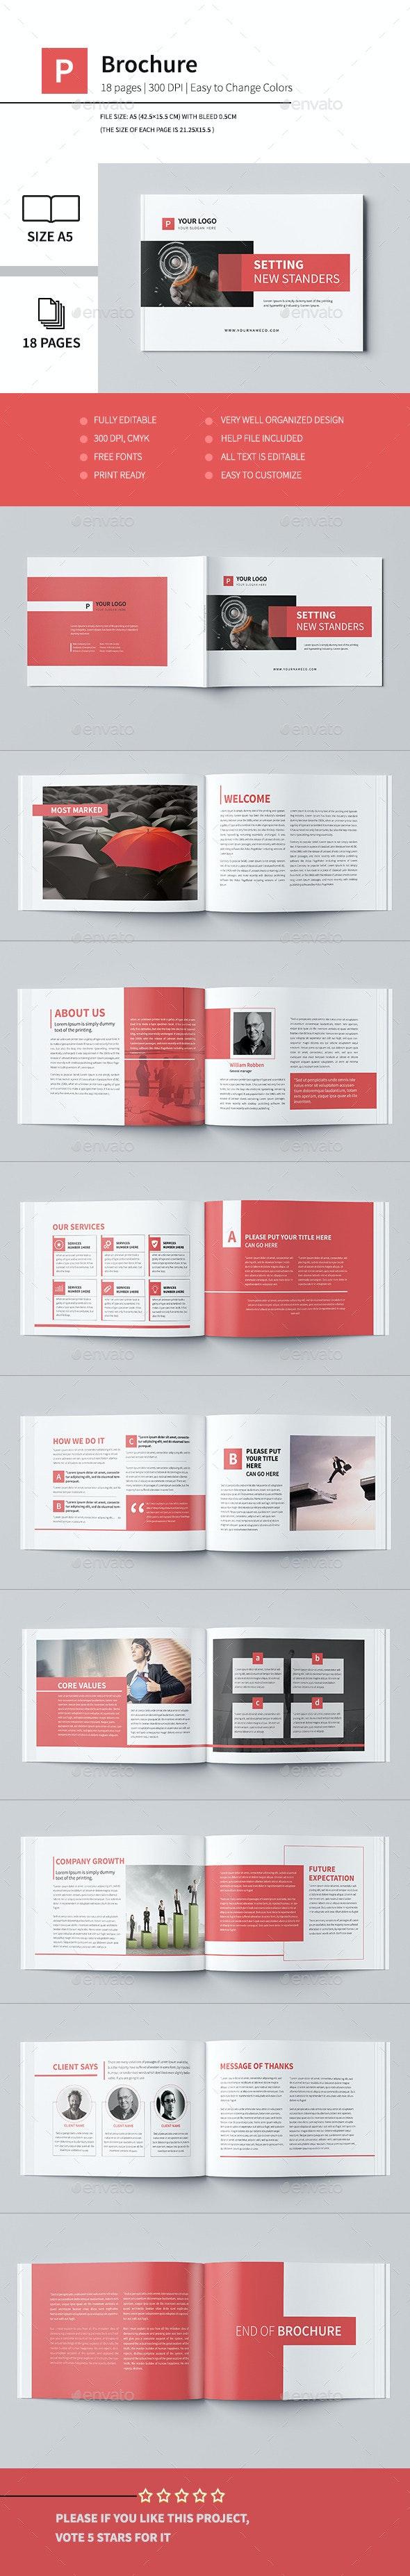 Minimal Business Brochure IV - Corporate Brochures